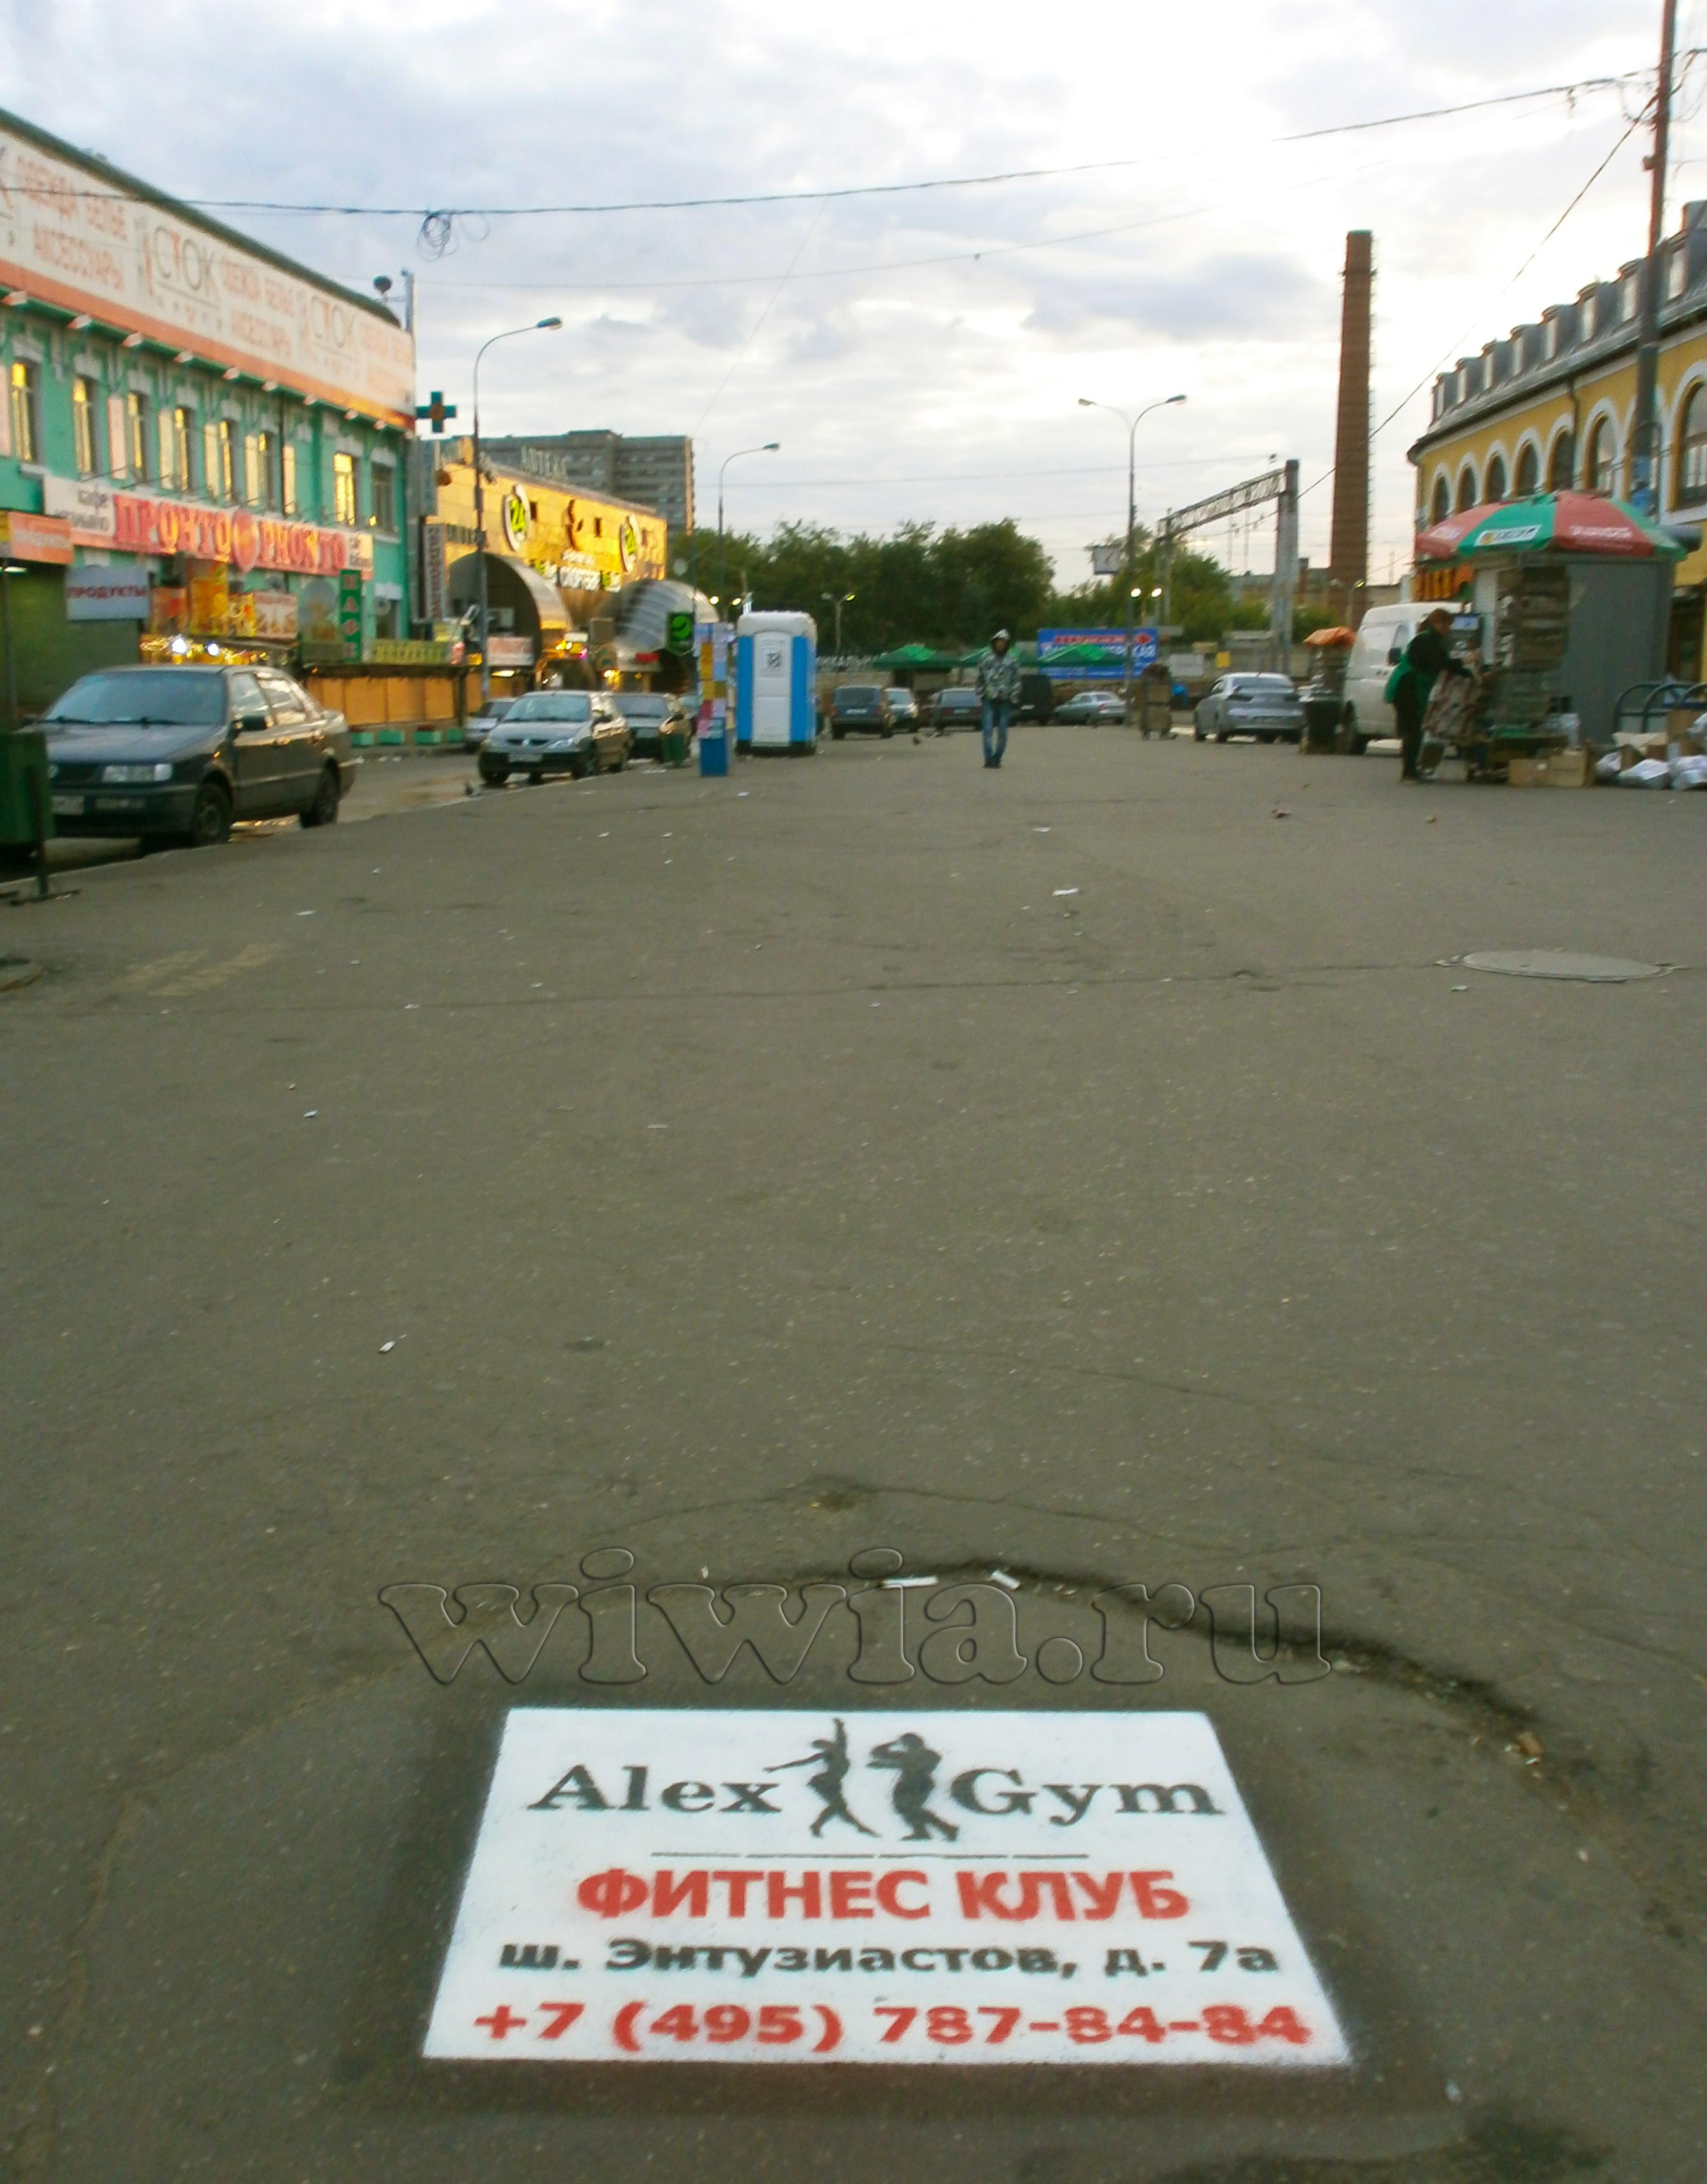 Alex Gym. Реклама на тротуаре.